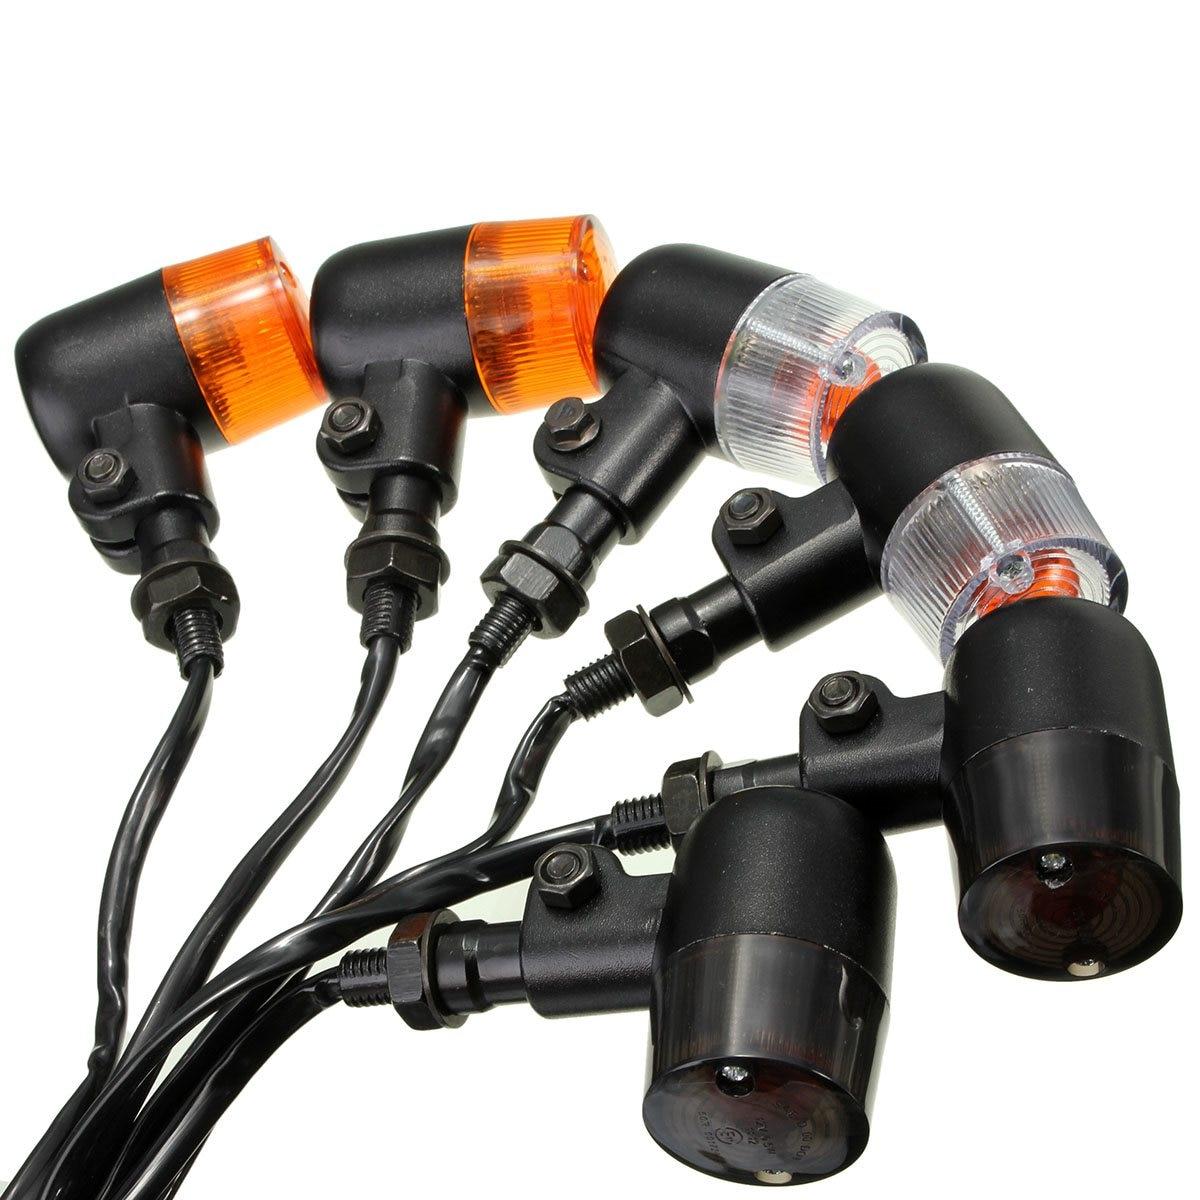 2PCS 12V Motorcycle Turn Signal Indicators Amber Light Lamp For Honda /Yamaha /Suzuki